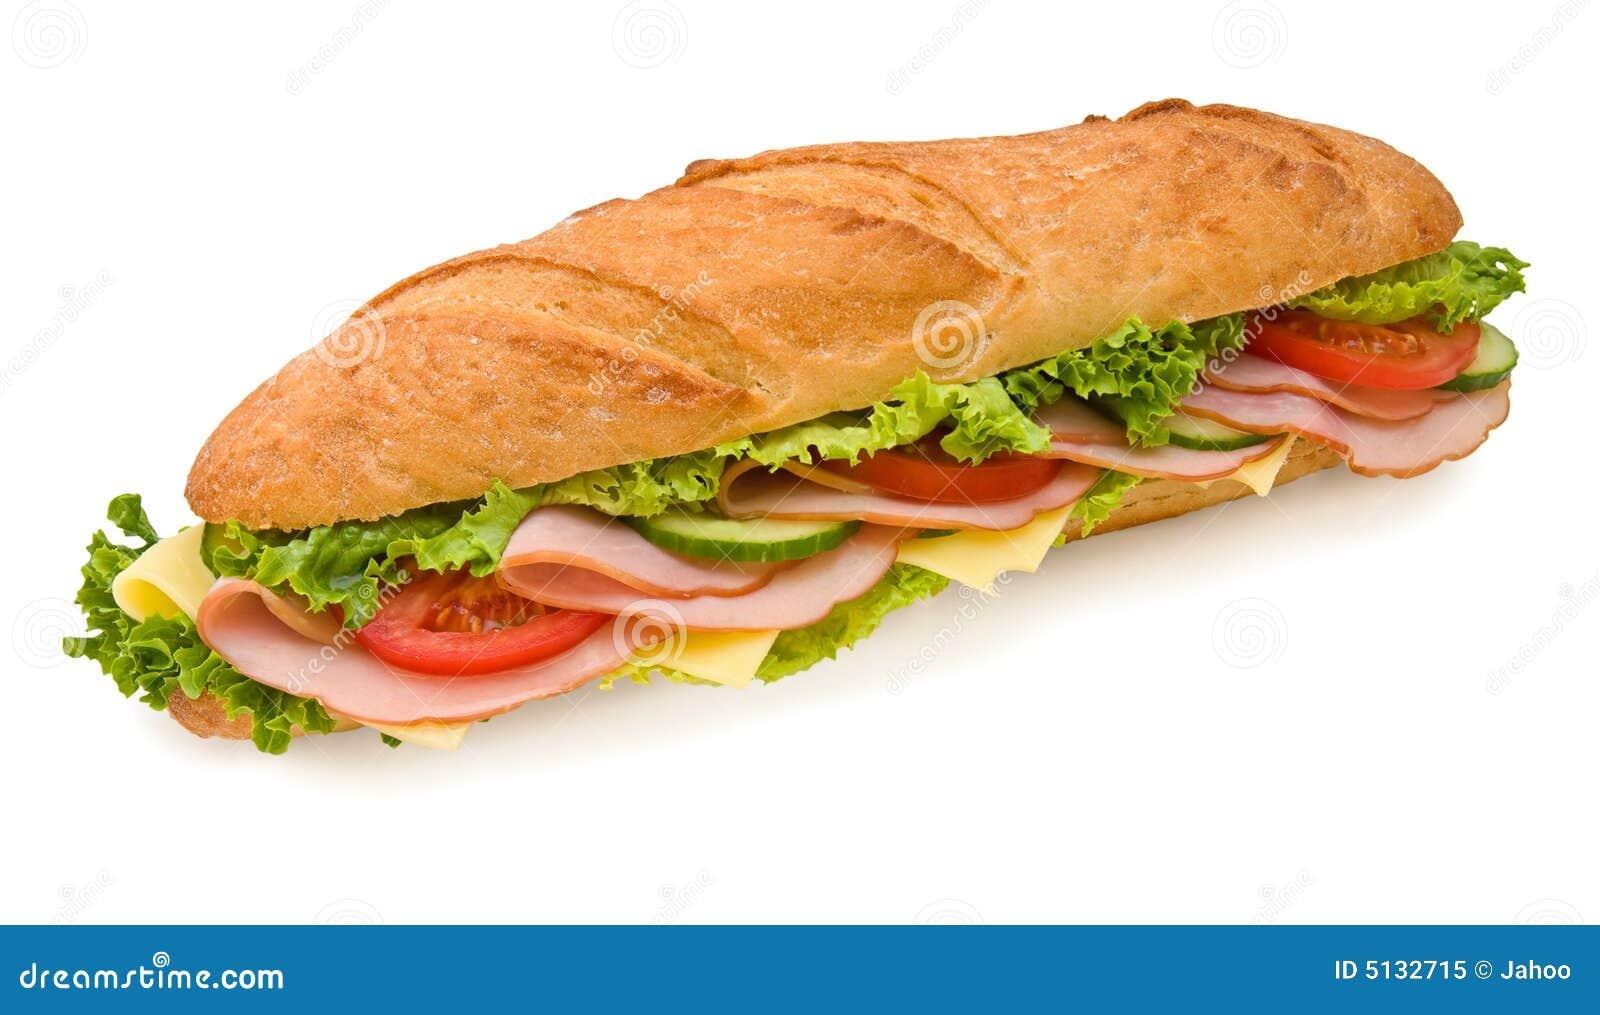 Footlong Ham & Cheese submarine sandwich